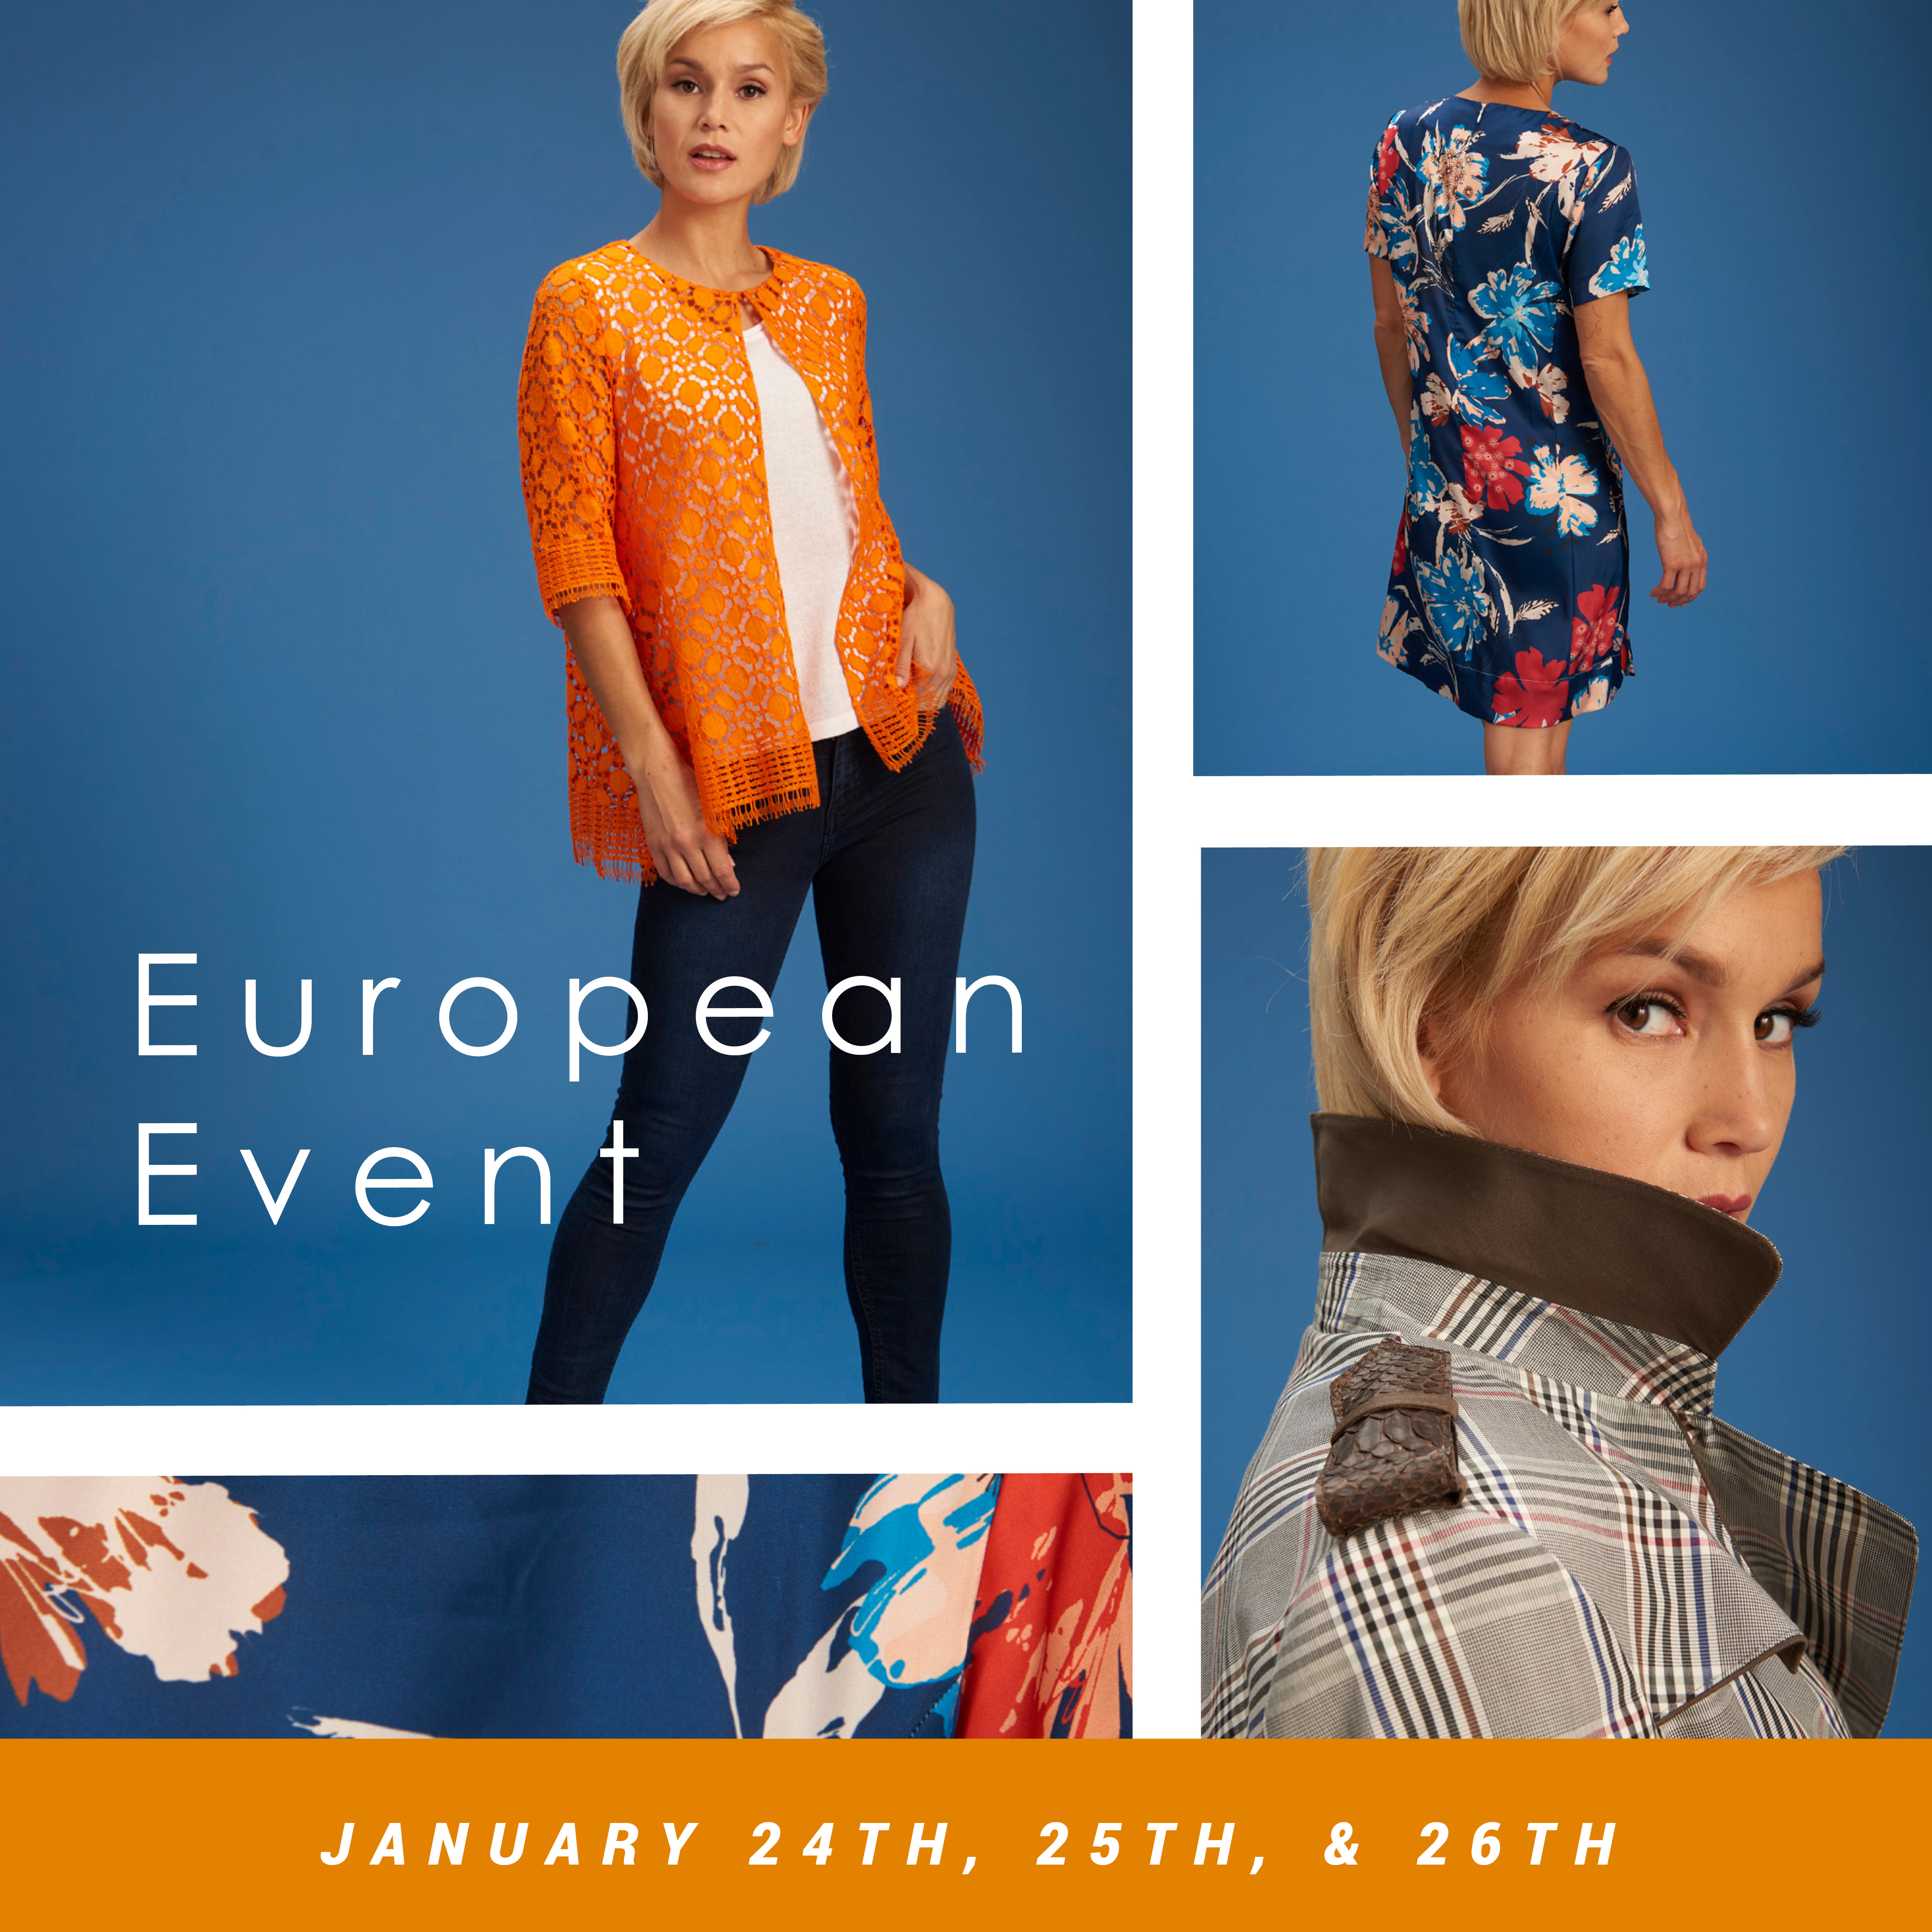 The European Event